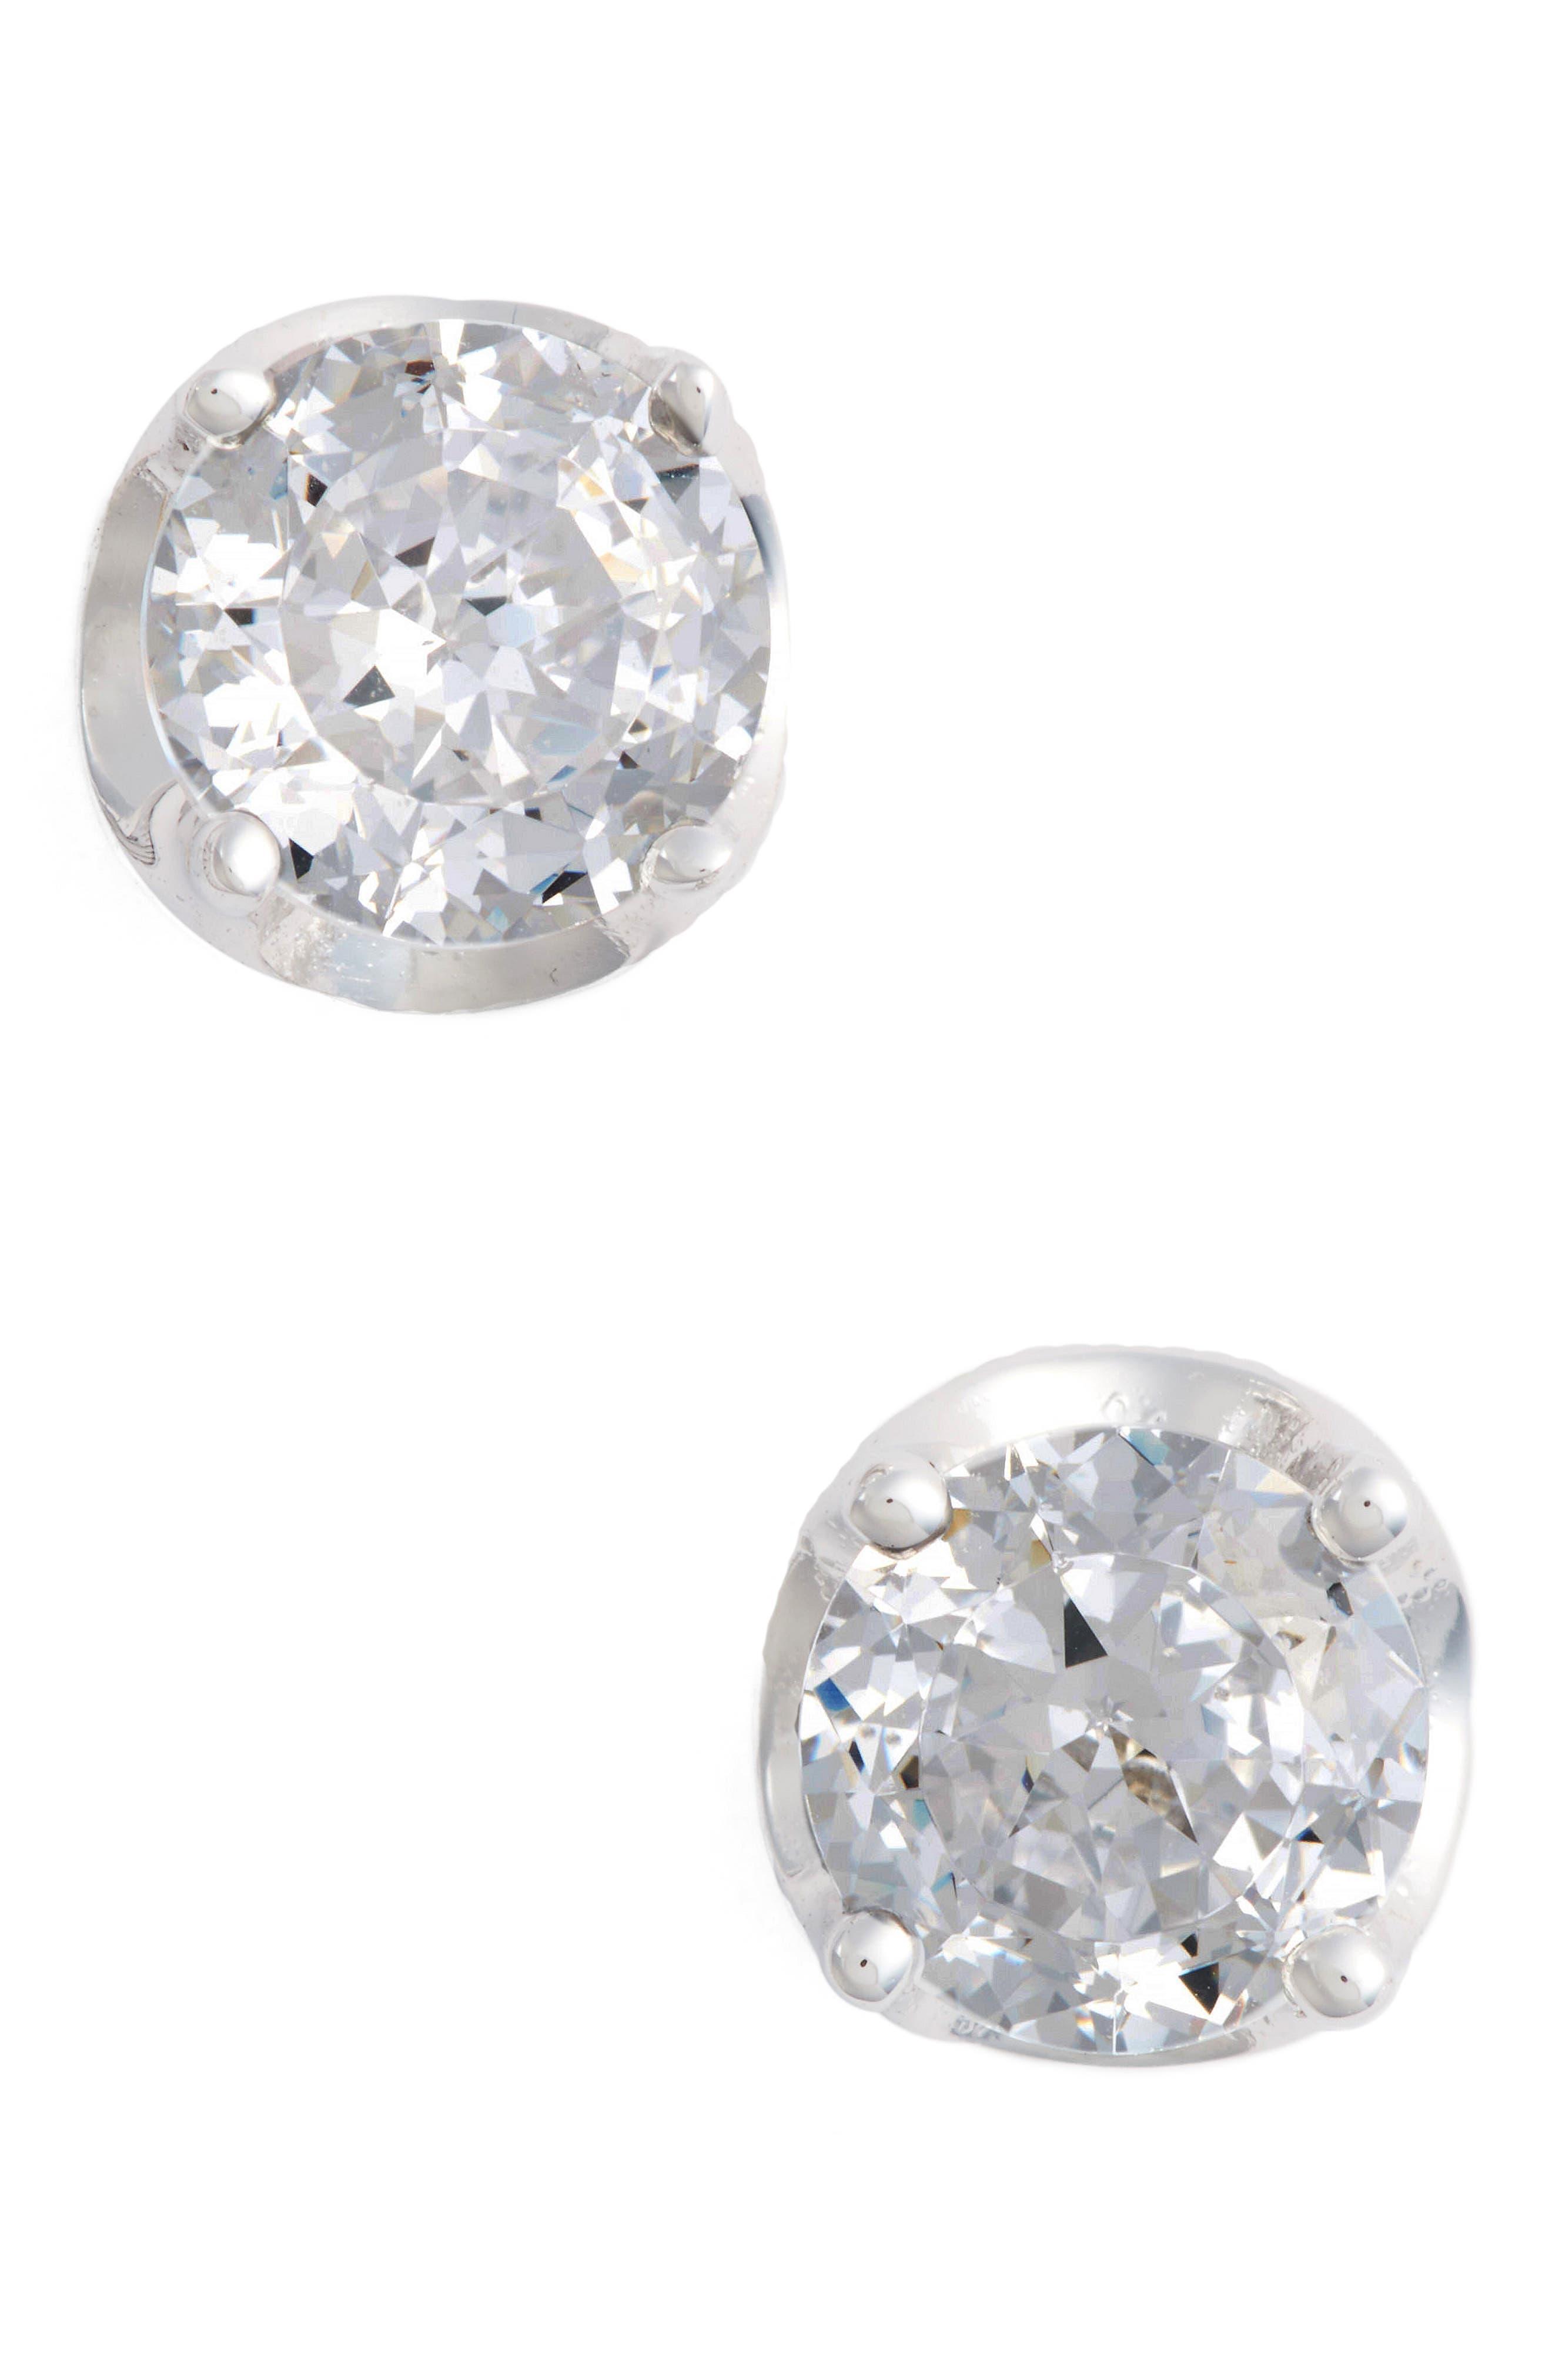 Simulated Diamond Stud Earrings,                         Main,                         color, 100